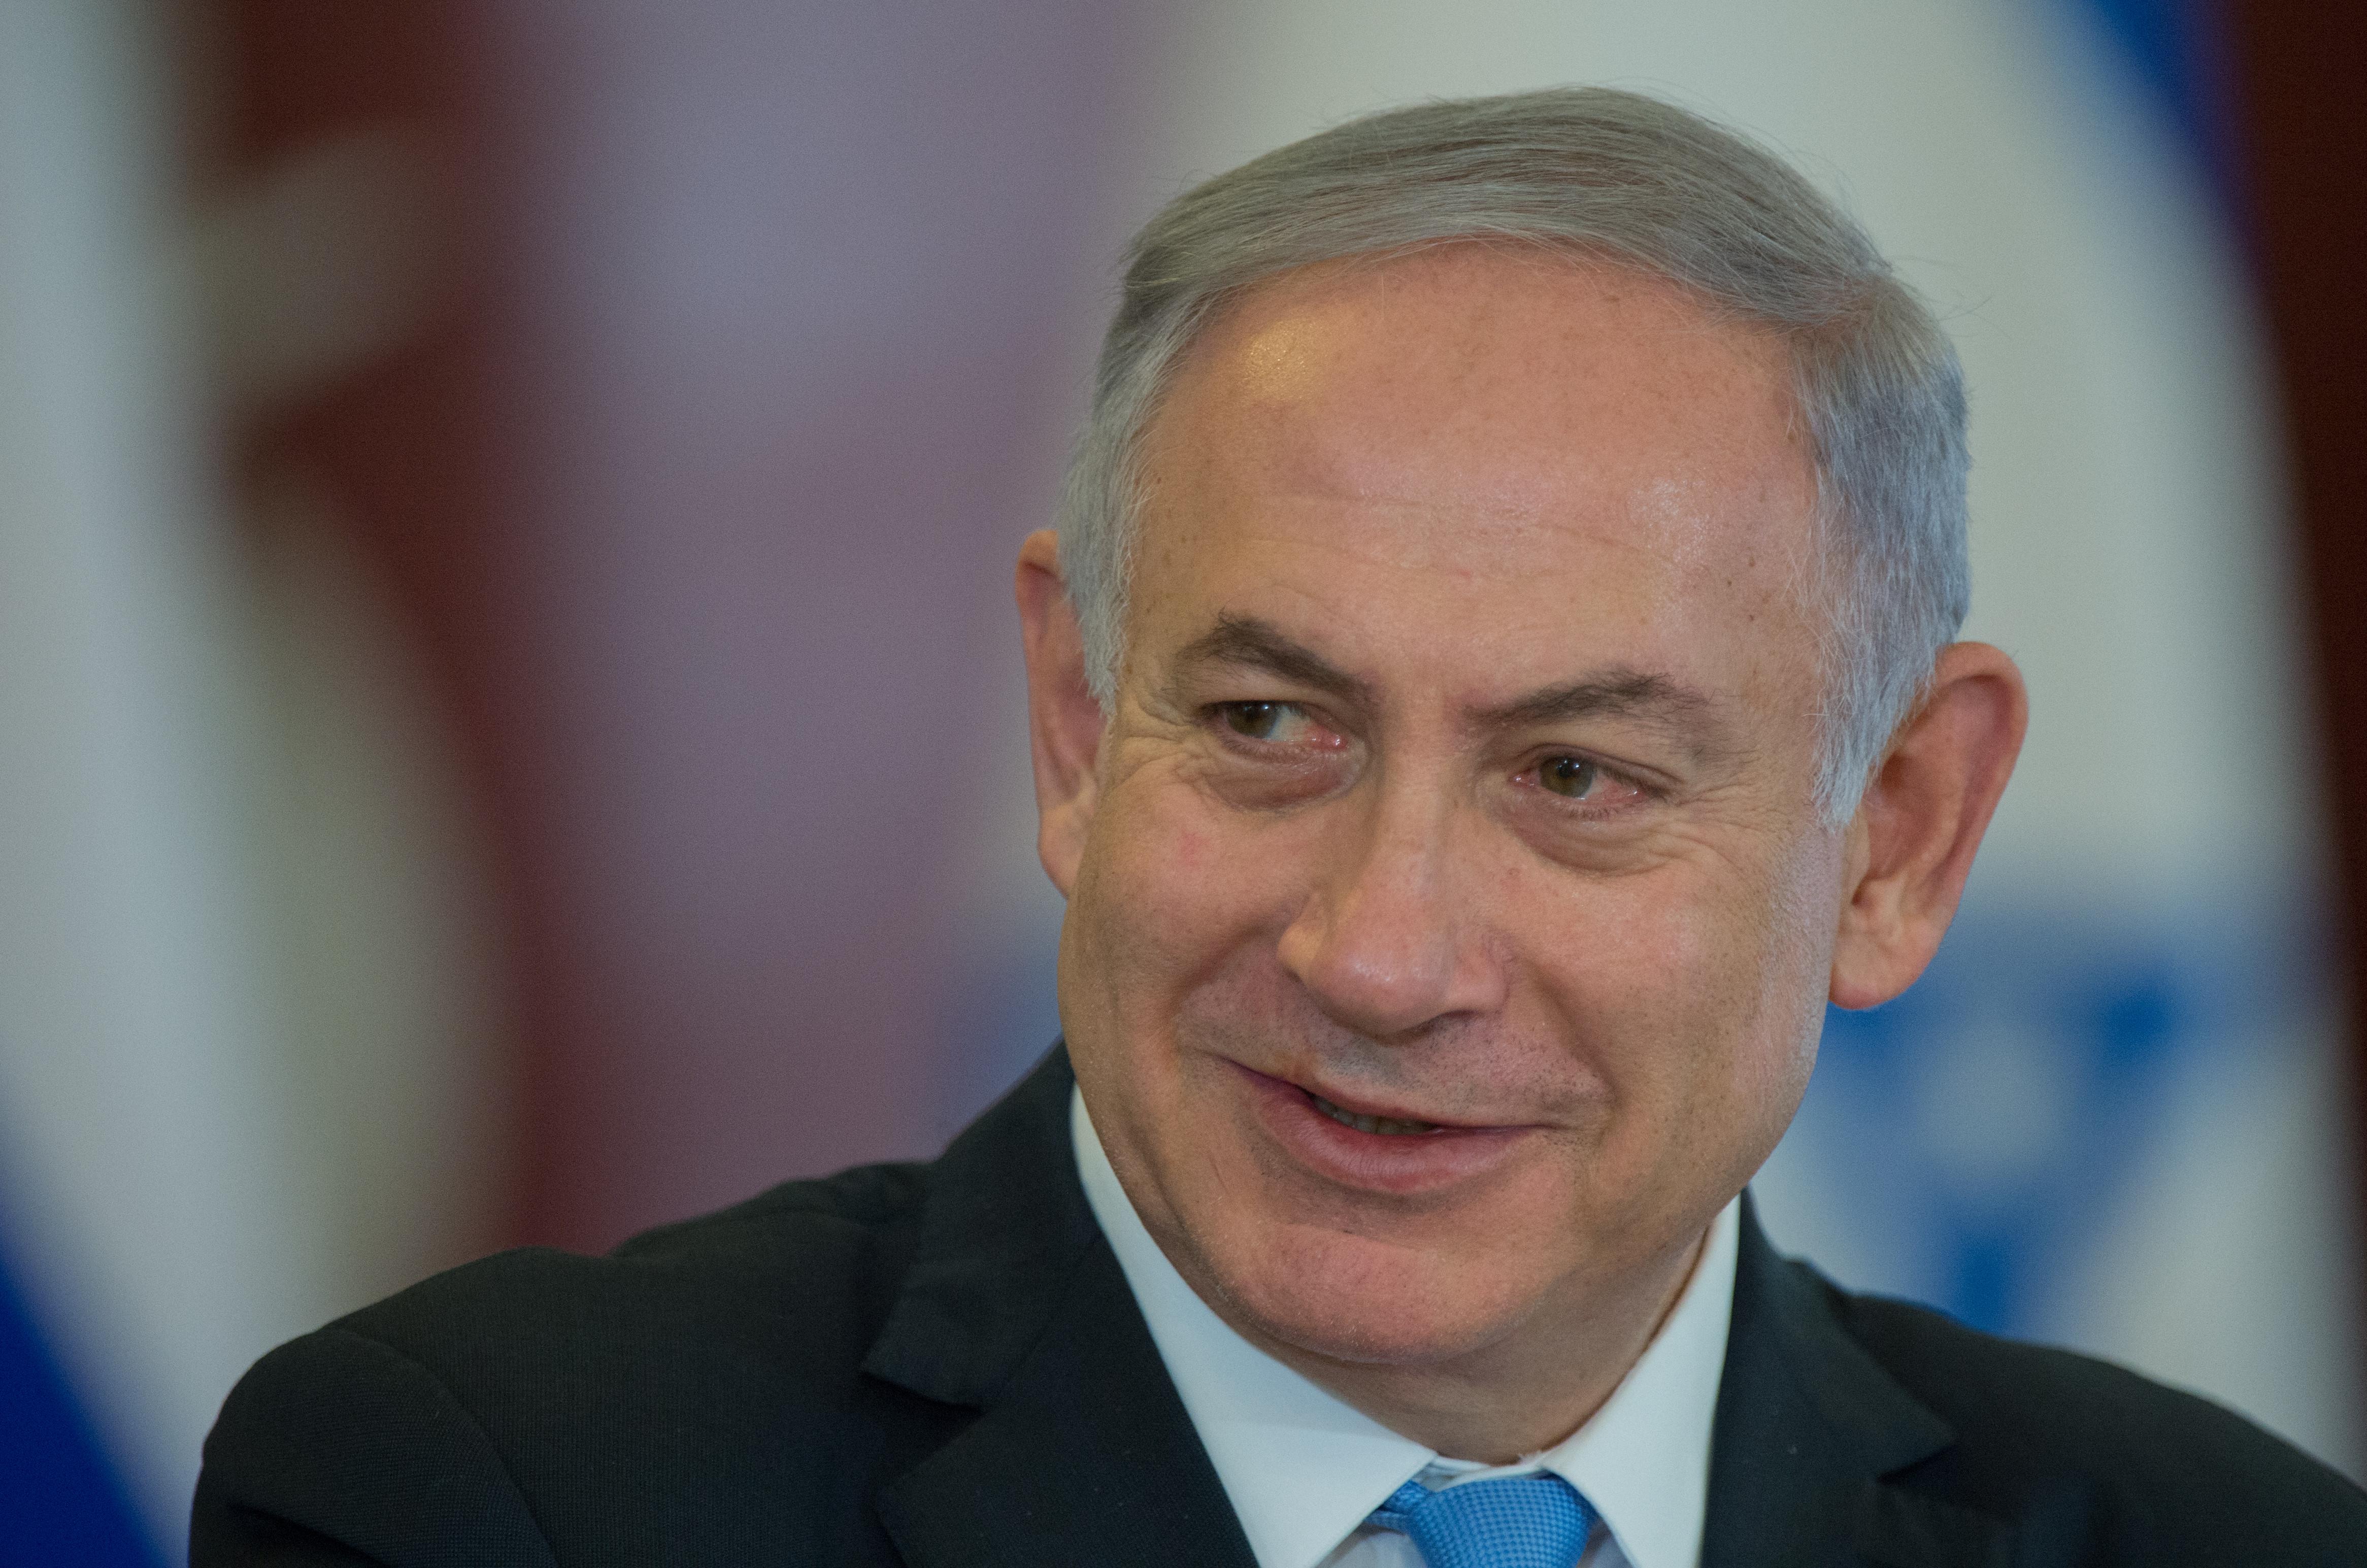 <p><span> Премьер-министр Израиля Биньямин Нетаньяху.&nbsp;</span>Фото: &copy;РИА Новости/Сергей Гунеев</p>